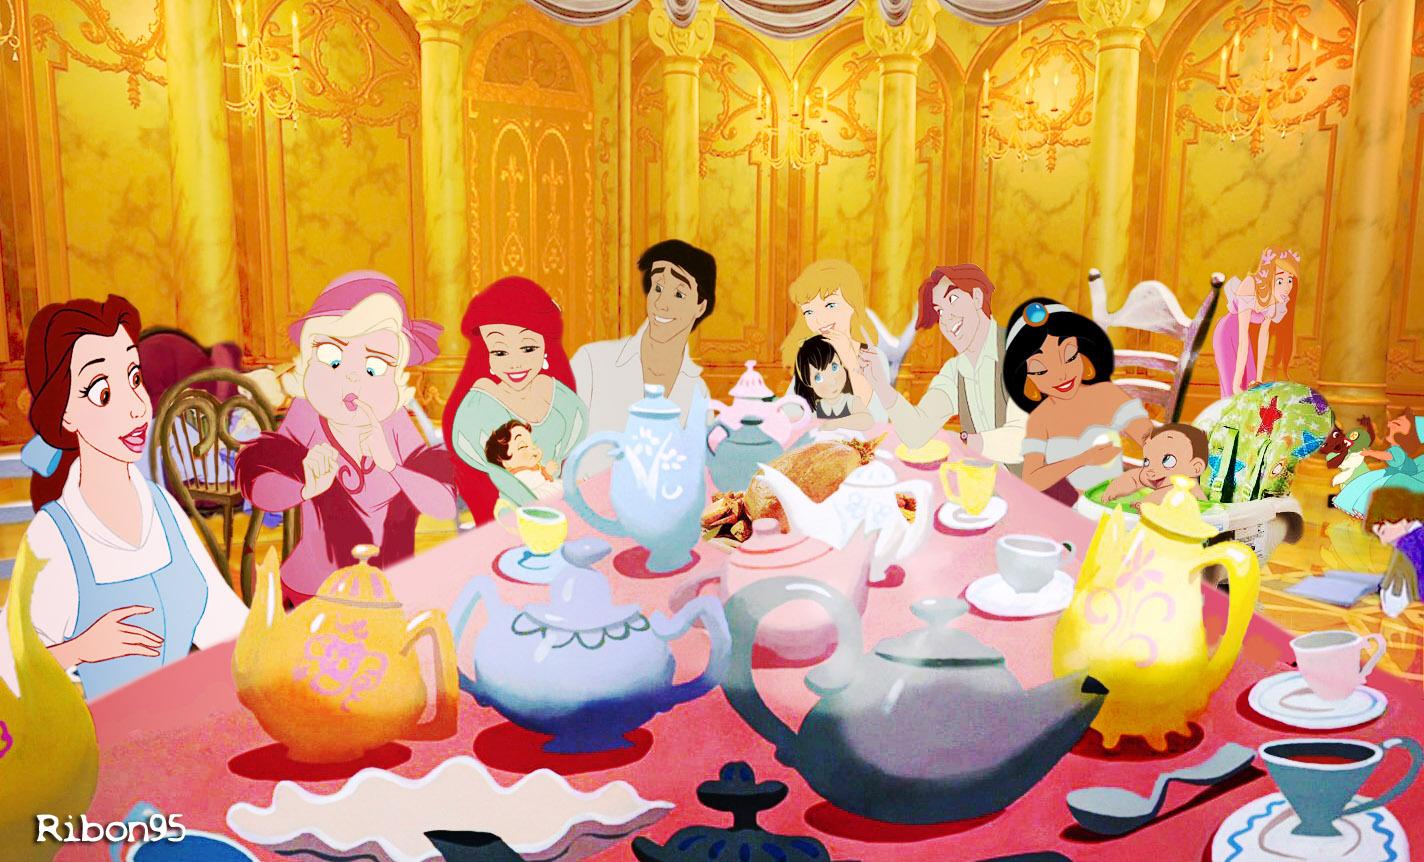 Free Fall Themed Desktop Wallpaper Принцессы Диснея за праздничным столом Дисней Принцессы